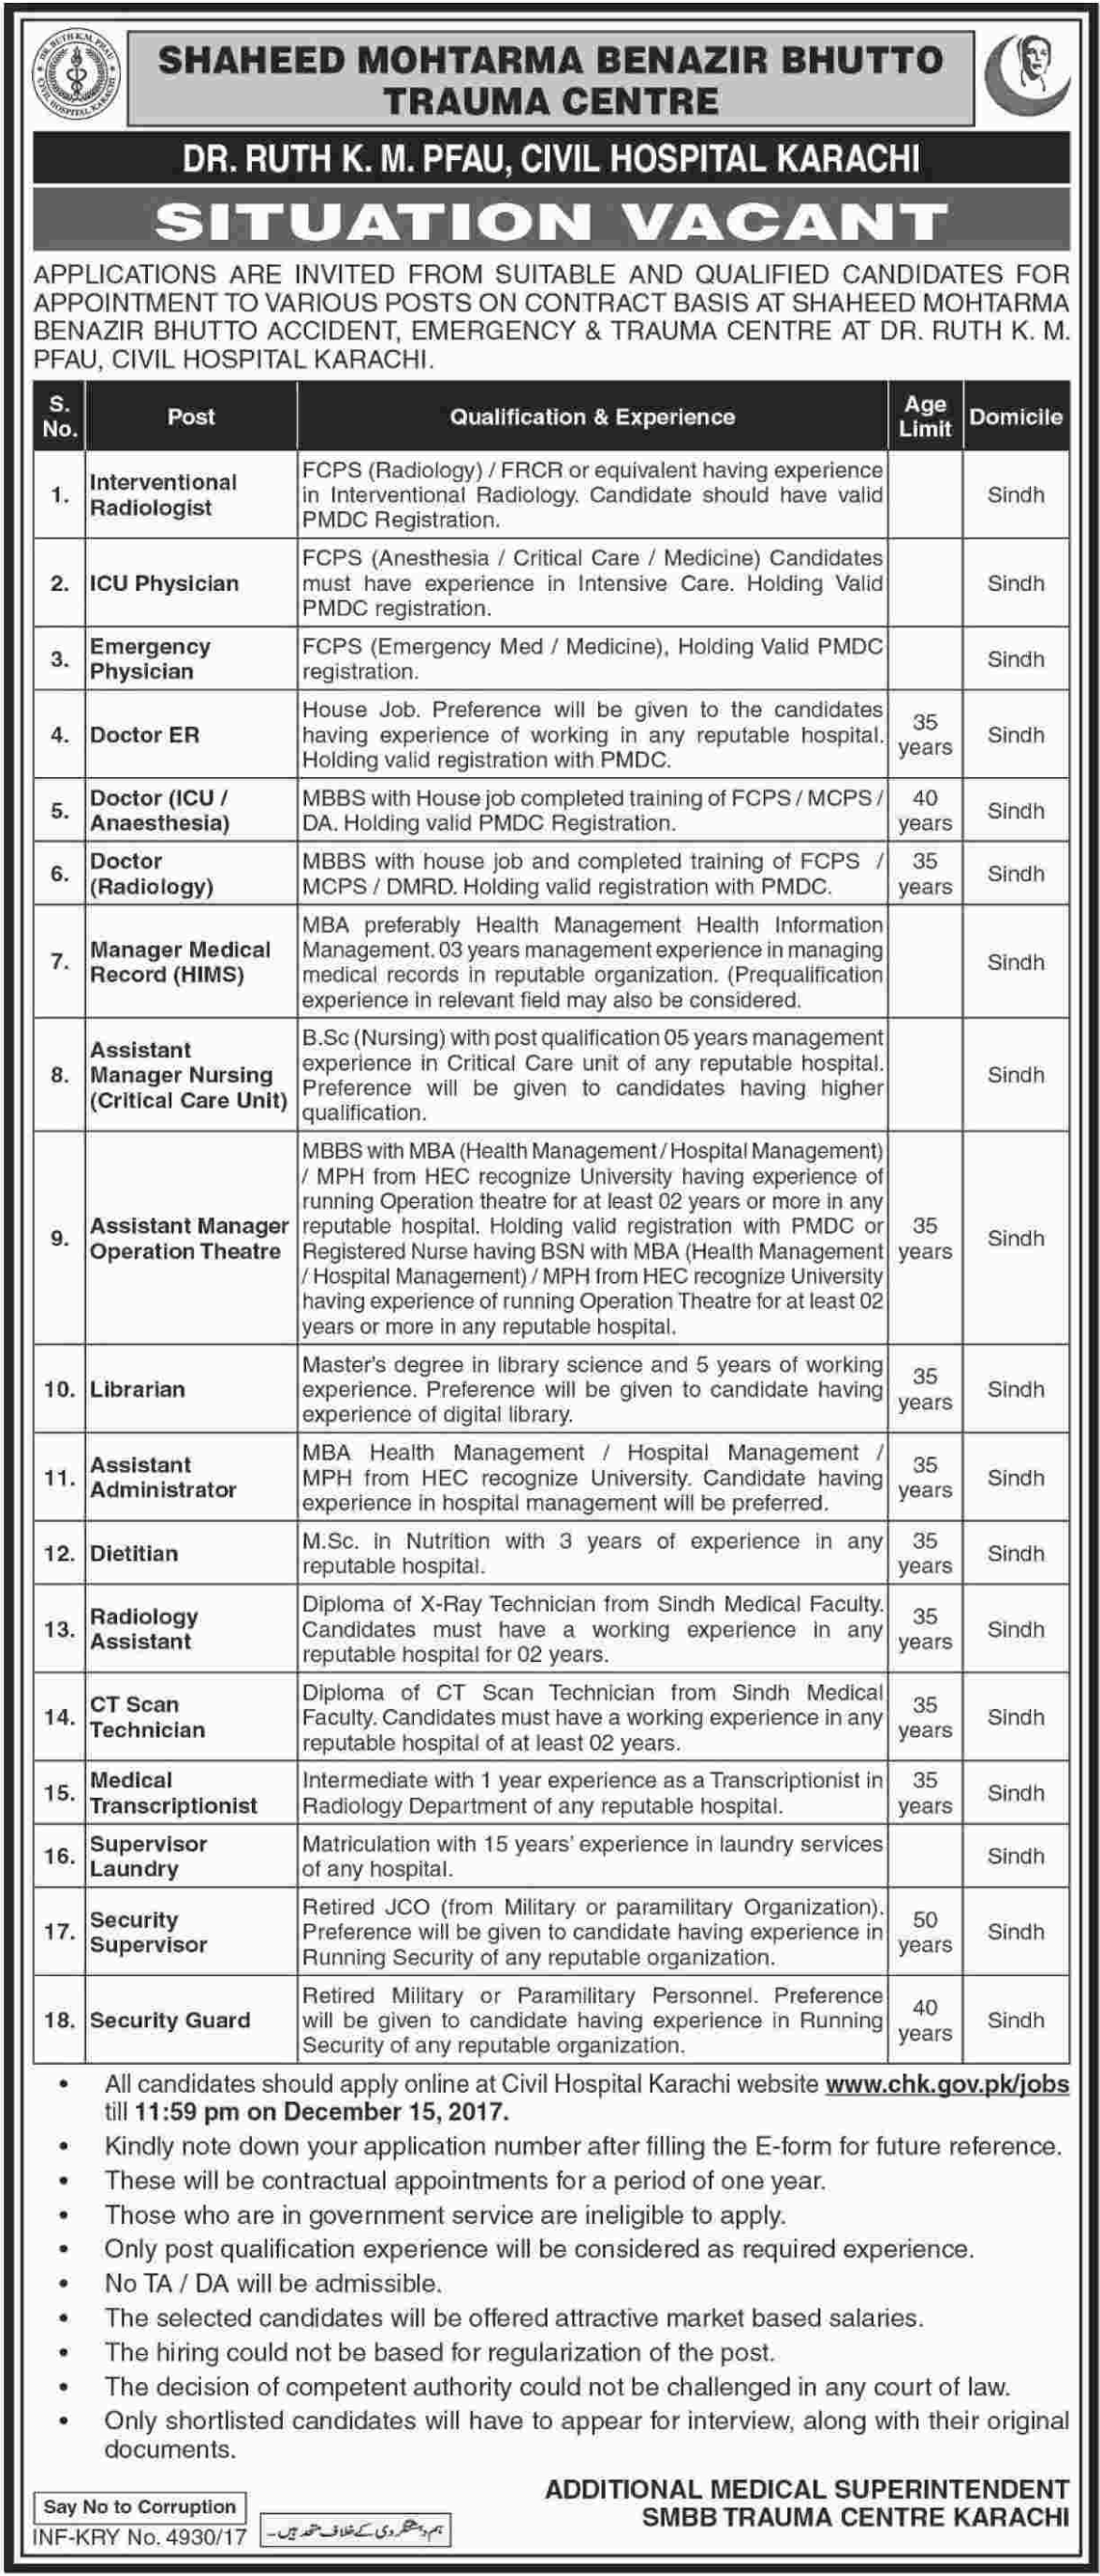 Civil Hospital Karachi Medical Staff Jobs 2017